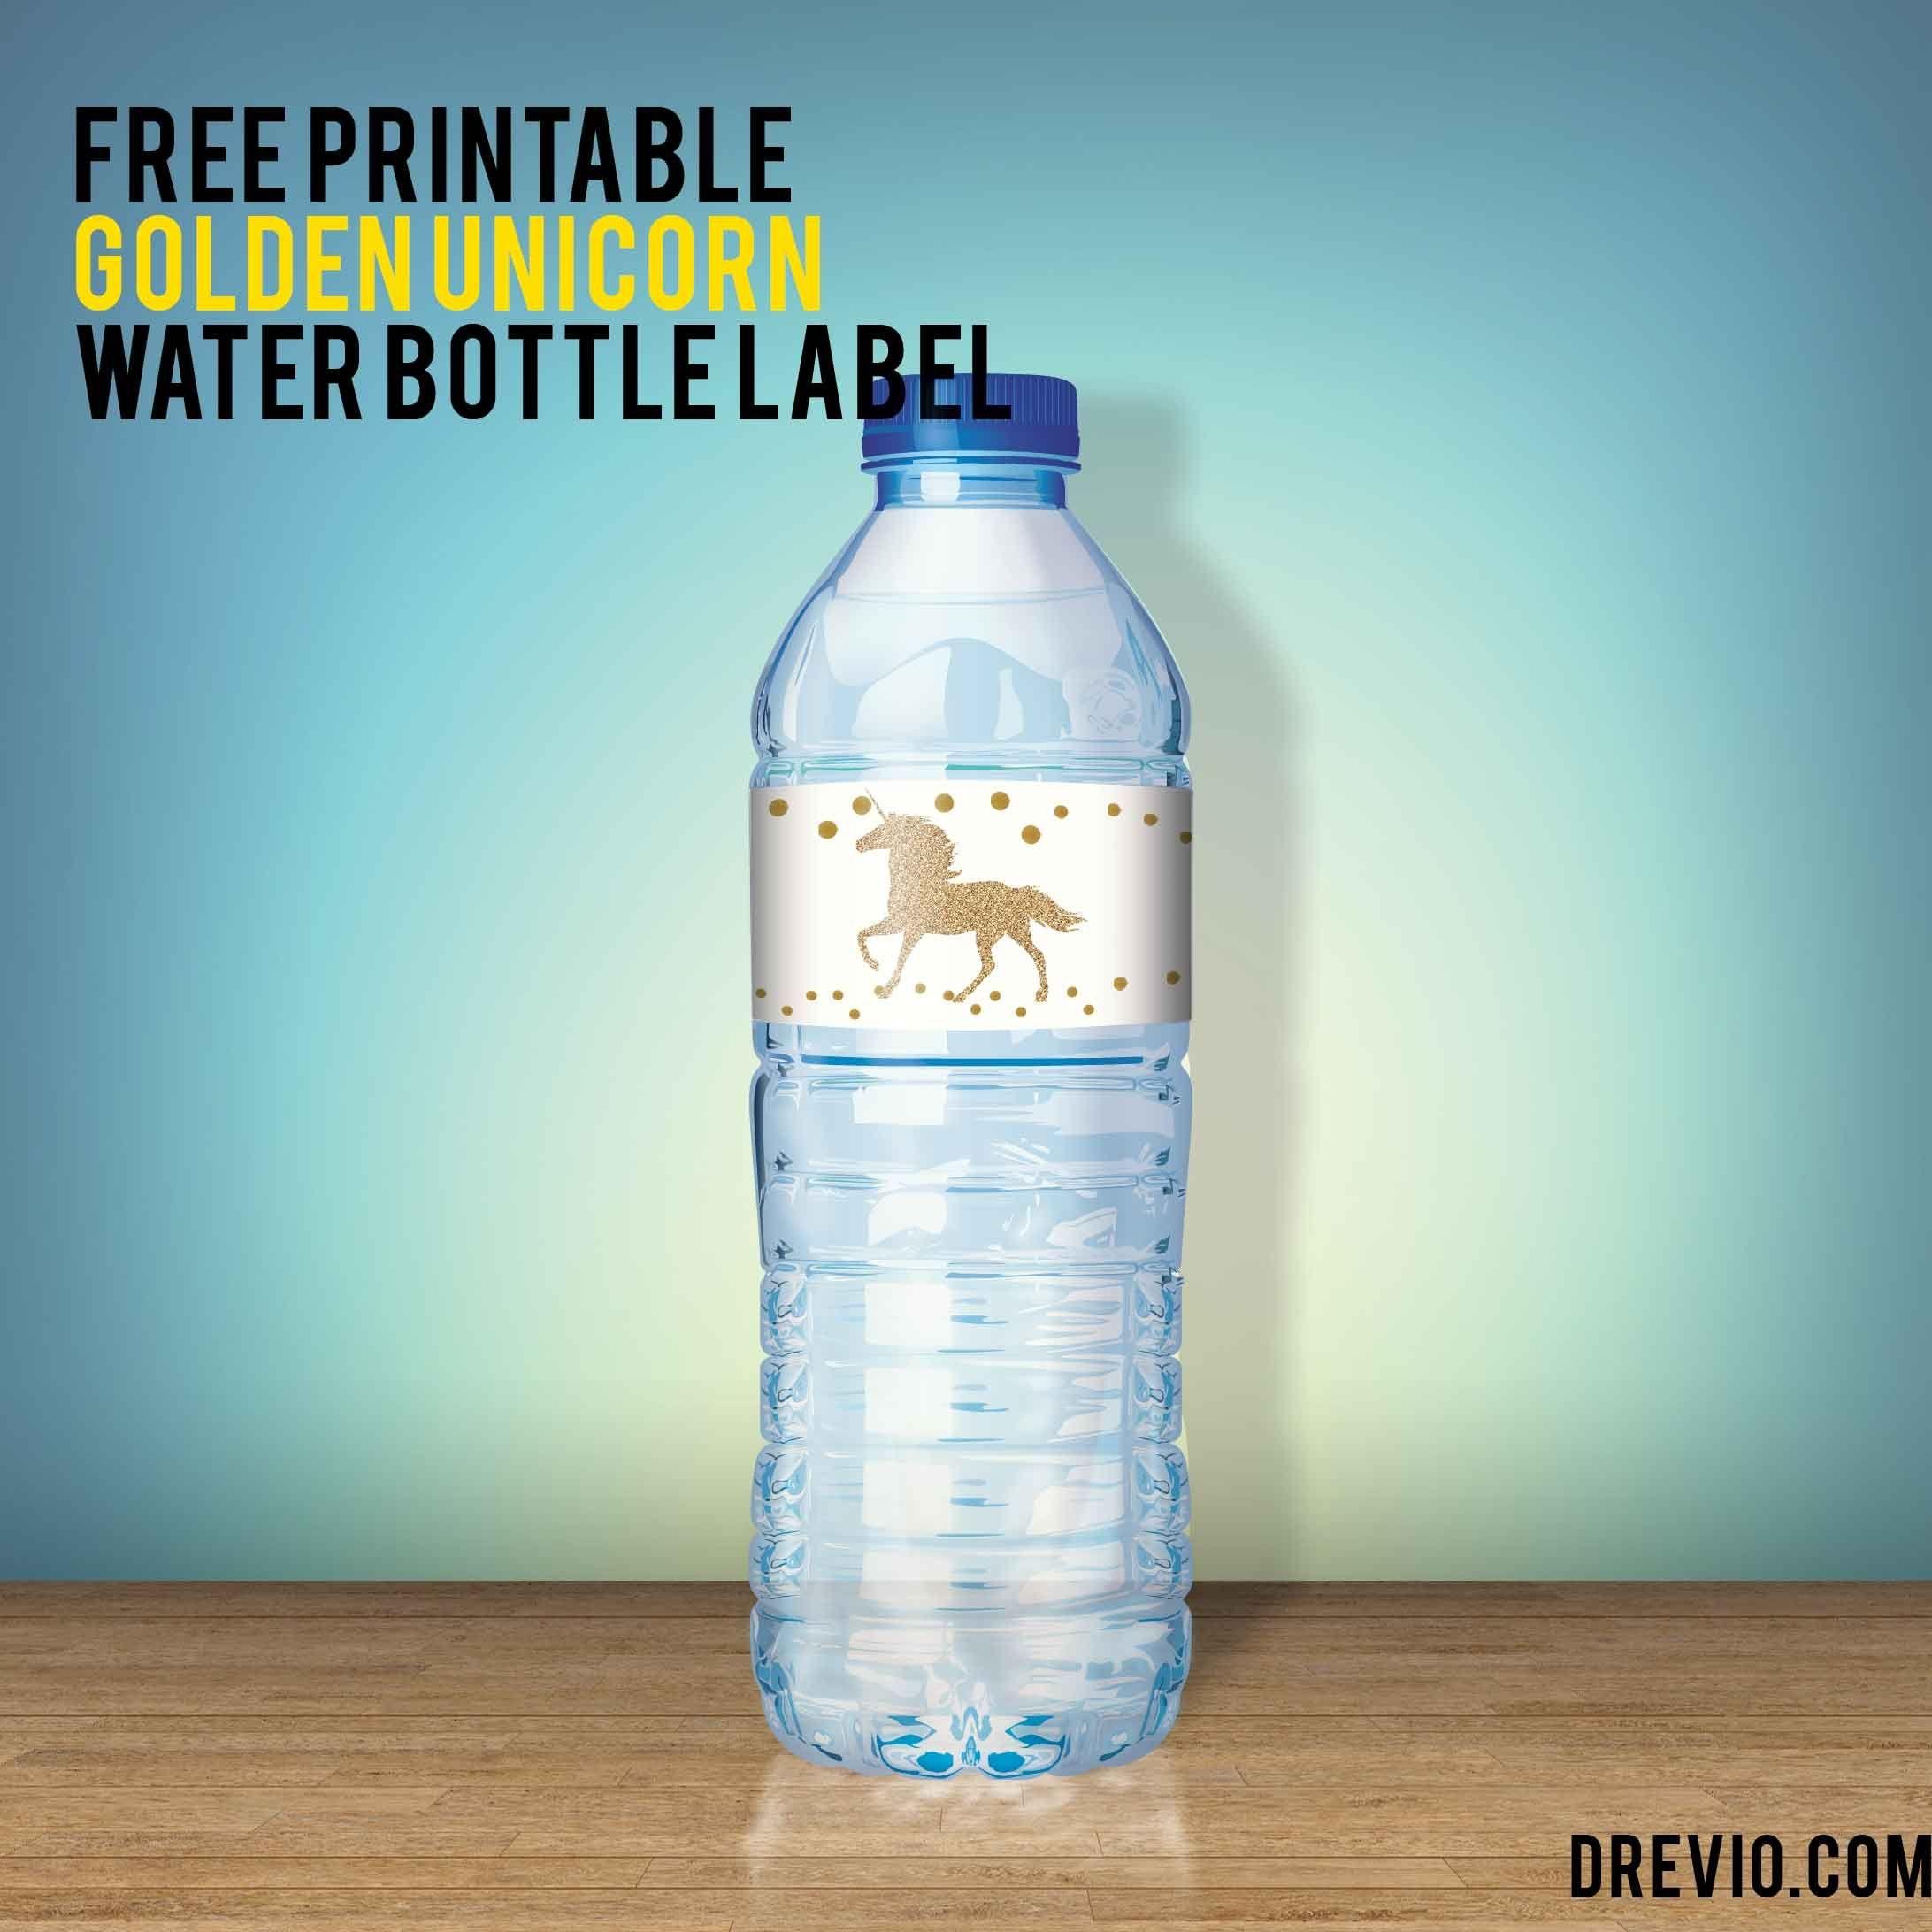 Free Unicorn Water Bottle Label - | Free Printable Birthday - Free Printable Water Bottle Labels For Birthday